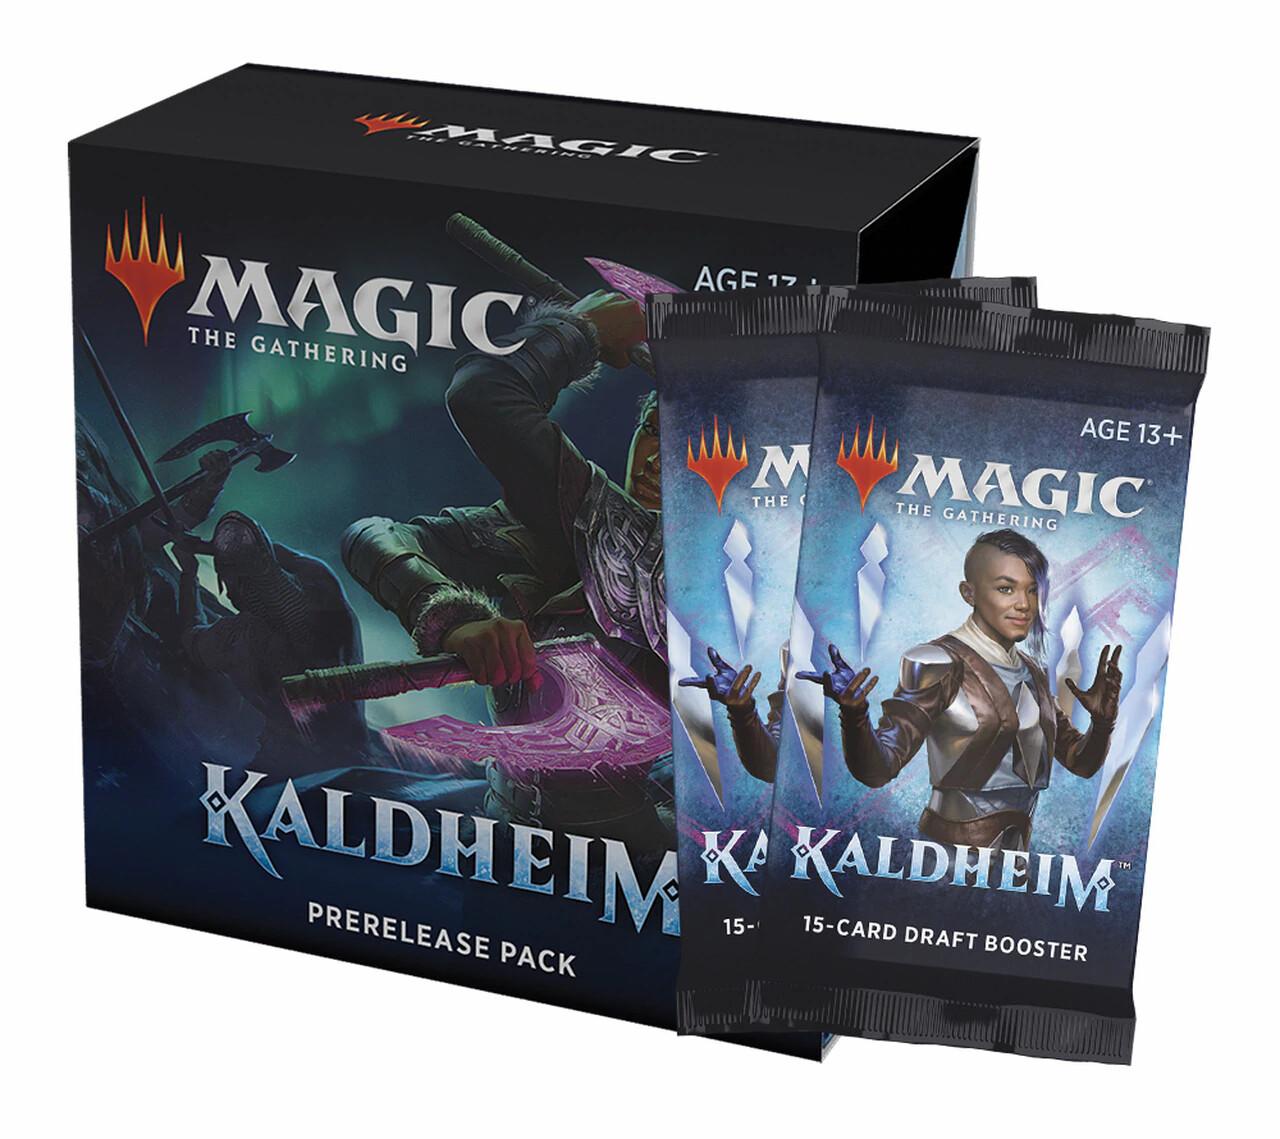 MTG Kaldheim Prerelease Kit Take-Home Kit